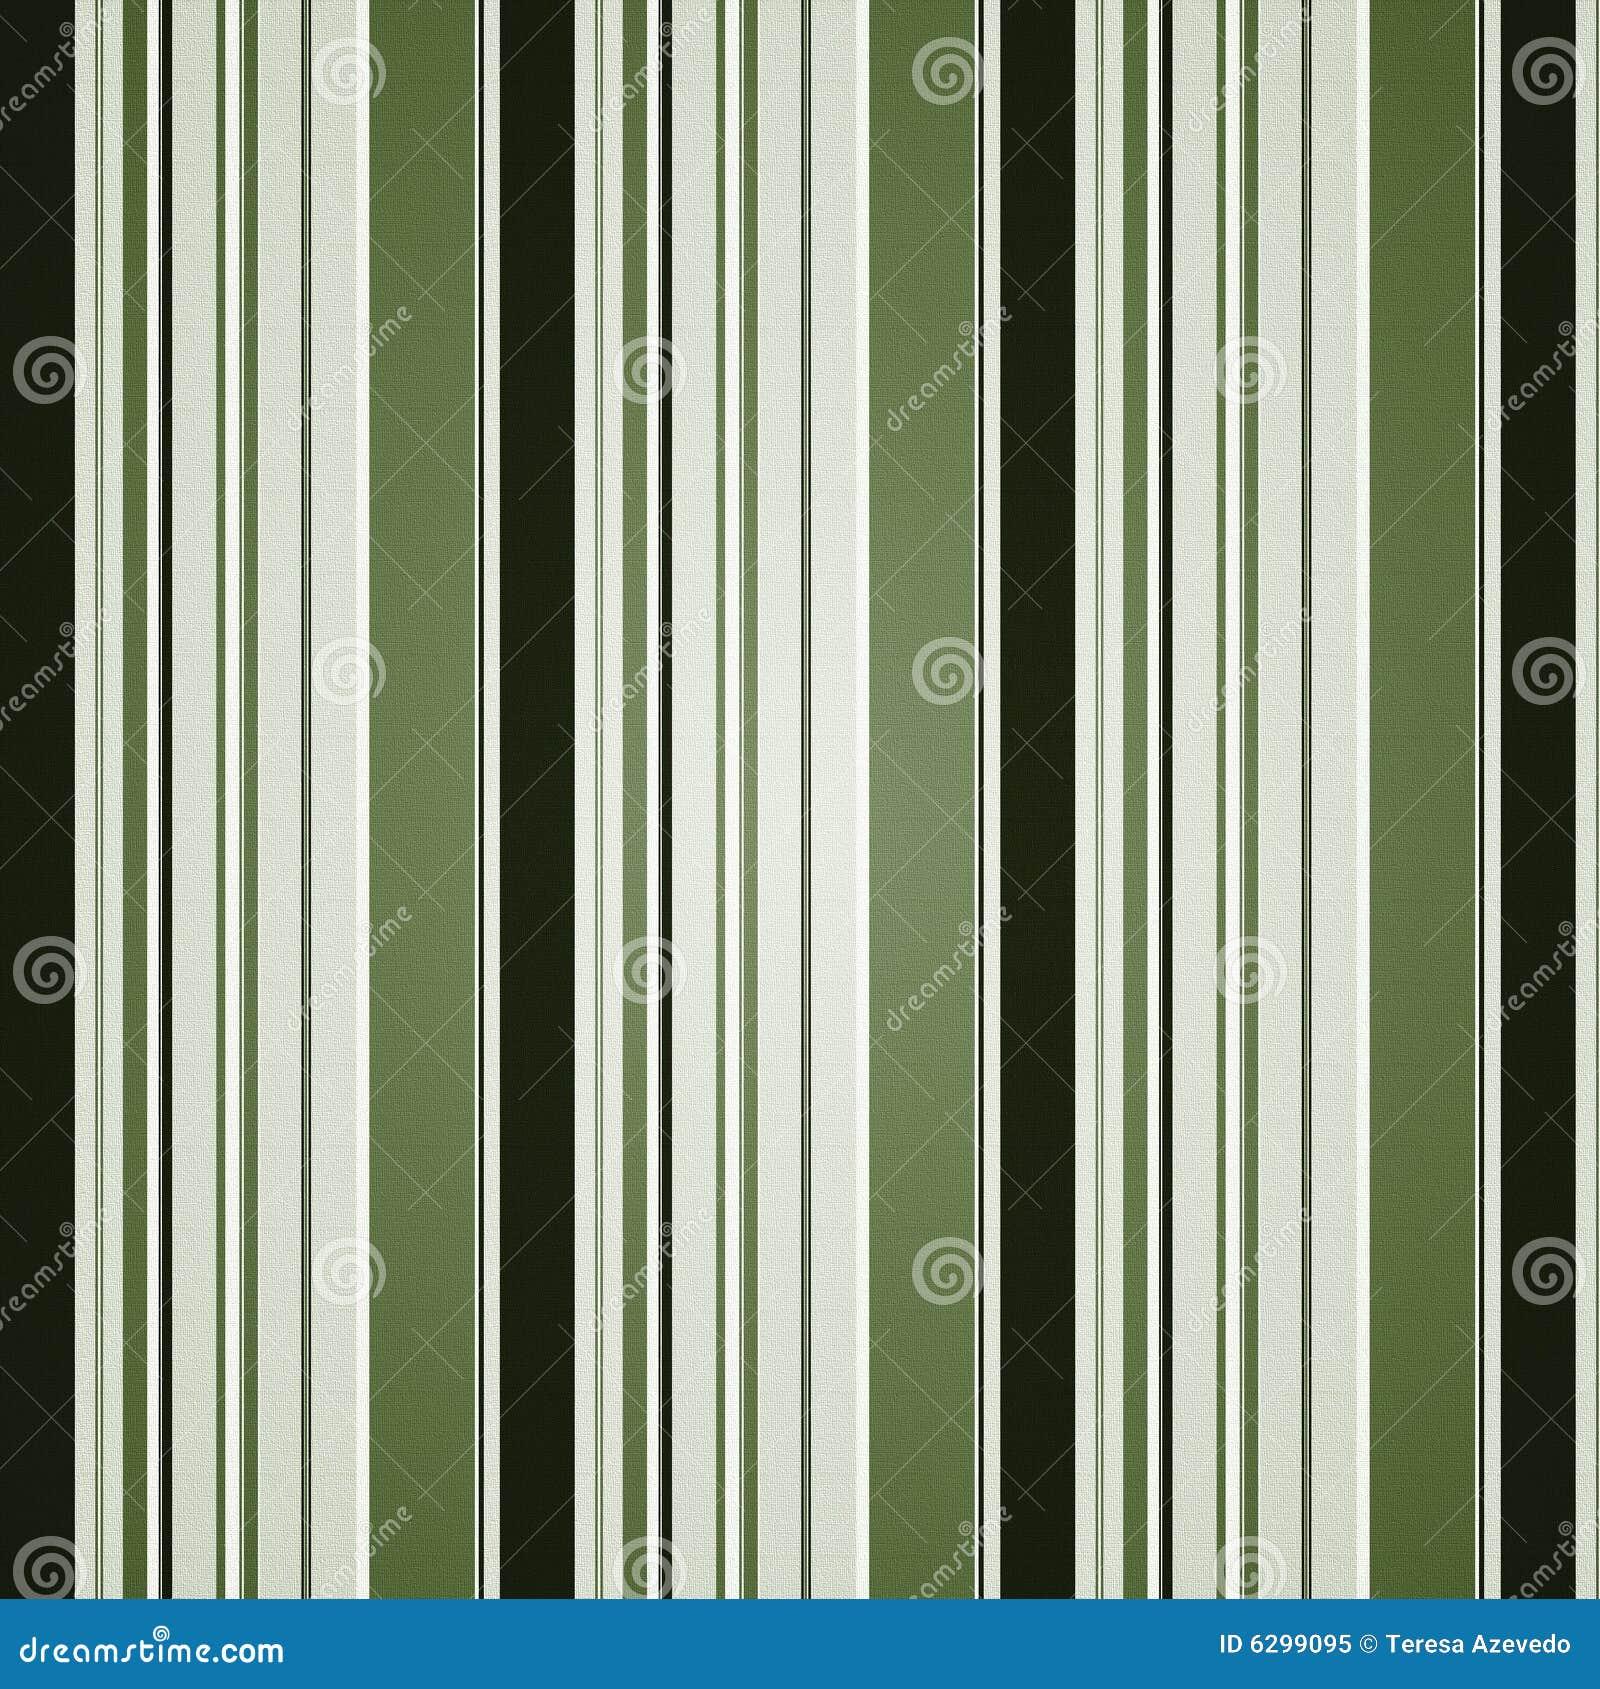 Stripes Background Green Olive Green Stock Image Image